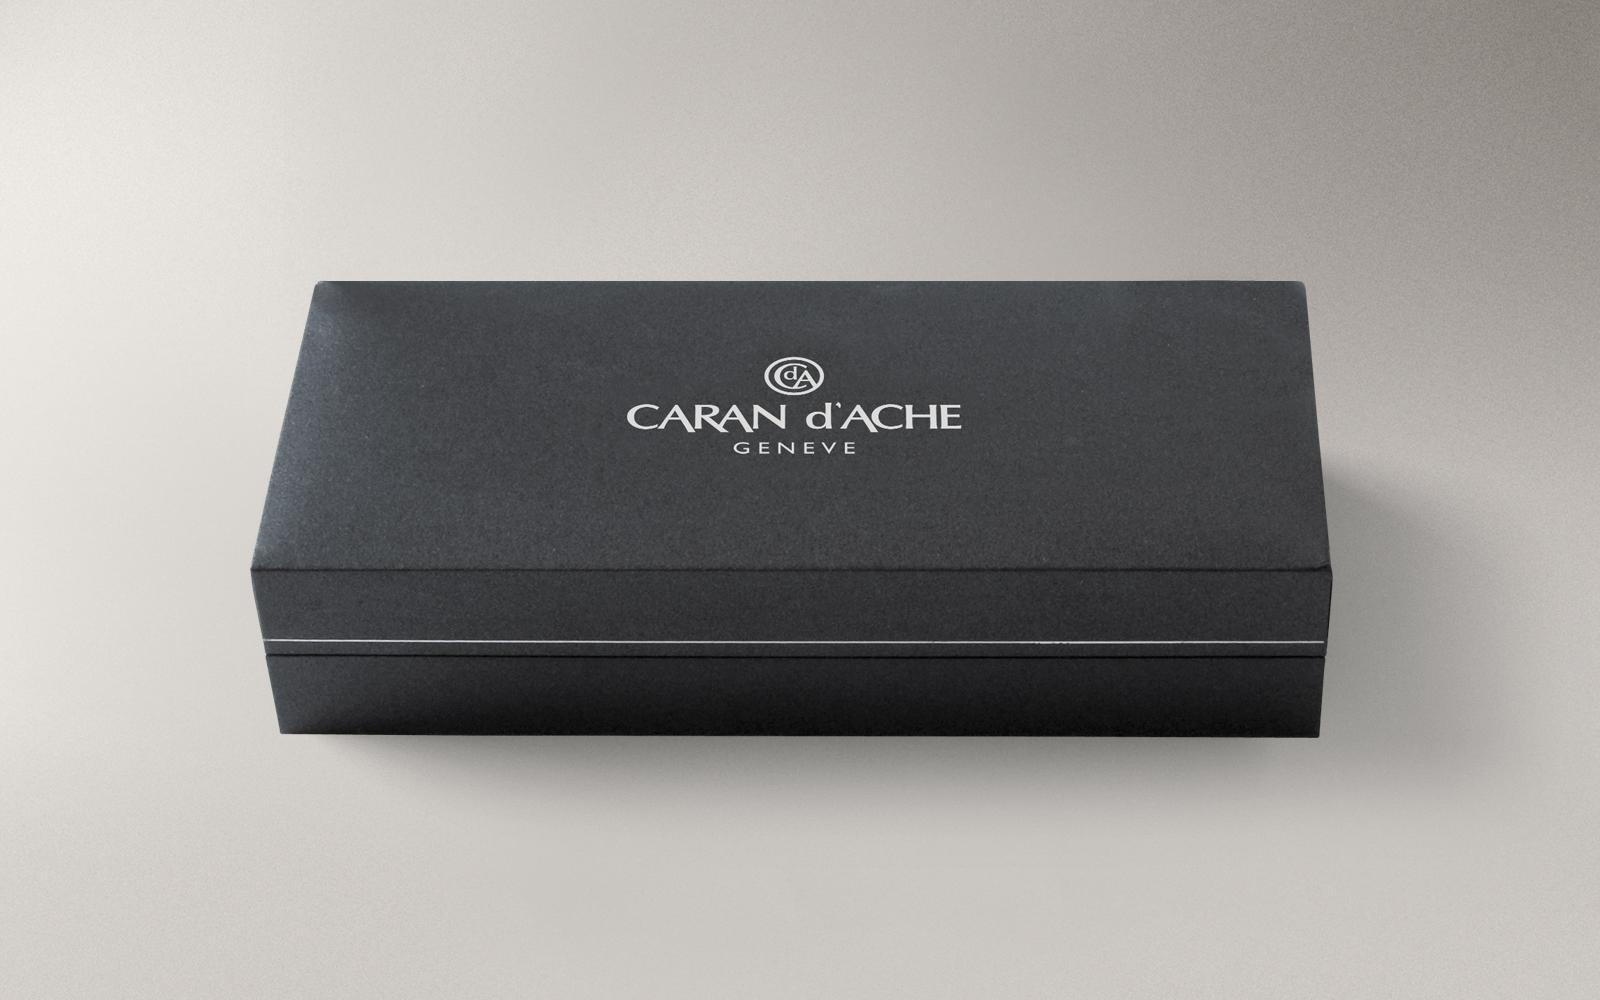 Carandache Leman - Ebony Black Lacquer GP, перьевая ручка, F